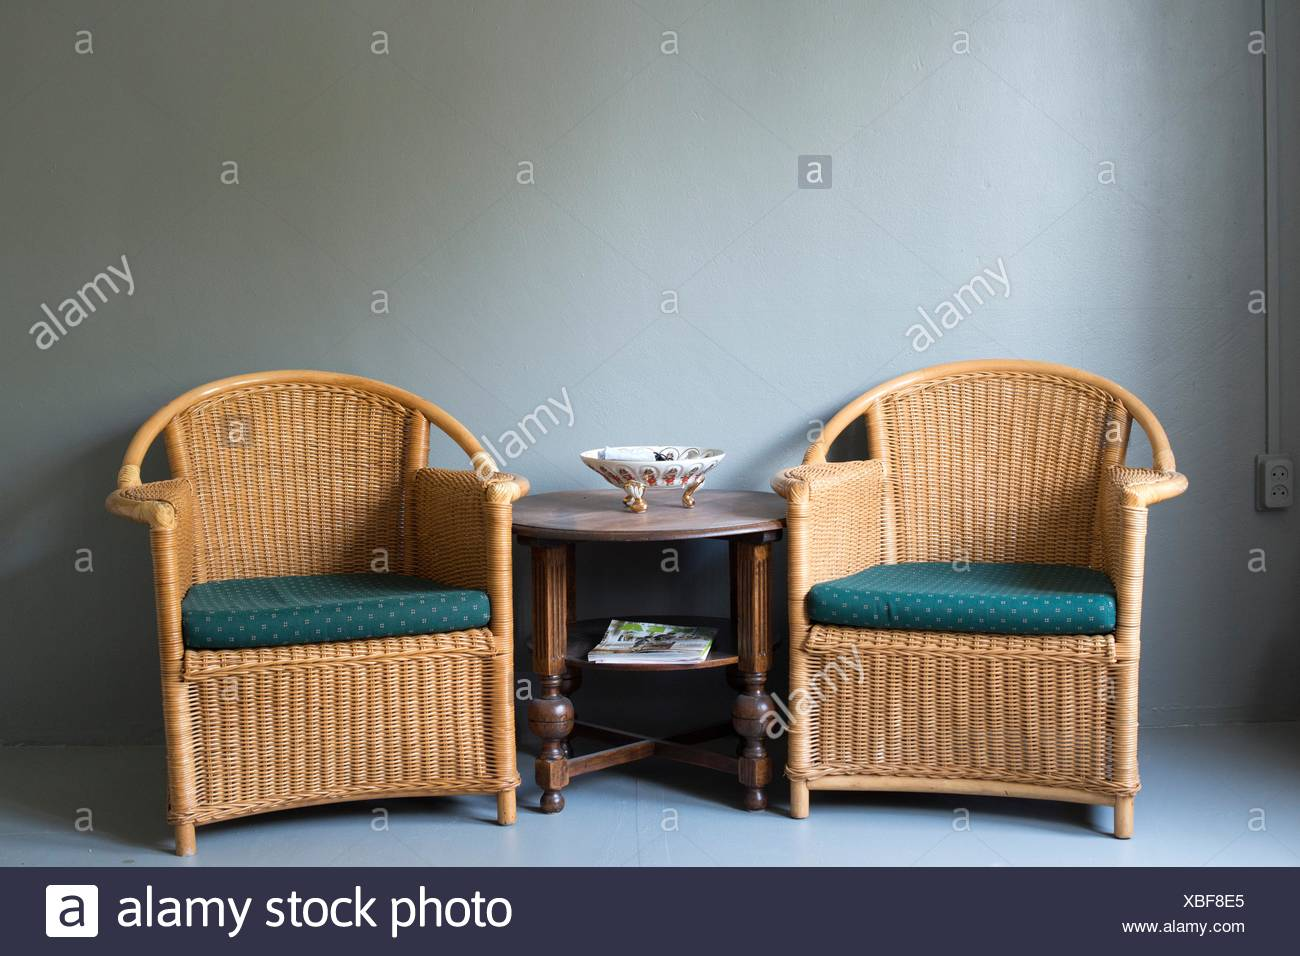 Sedie In Rattan Da Interno : Tilburg paesi bassi sedie di rattan e legno di antiquariato